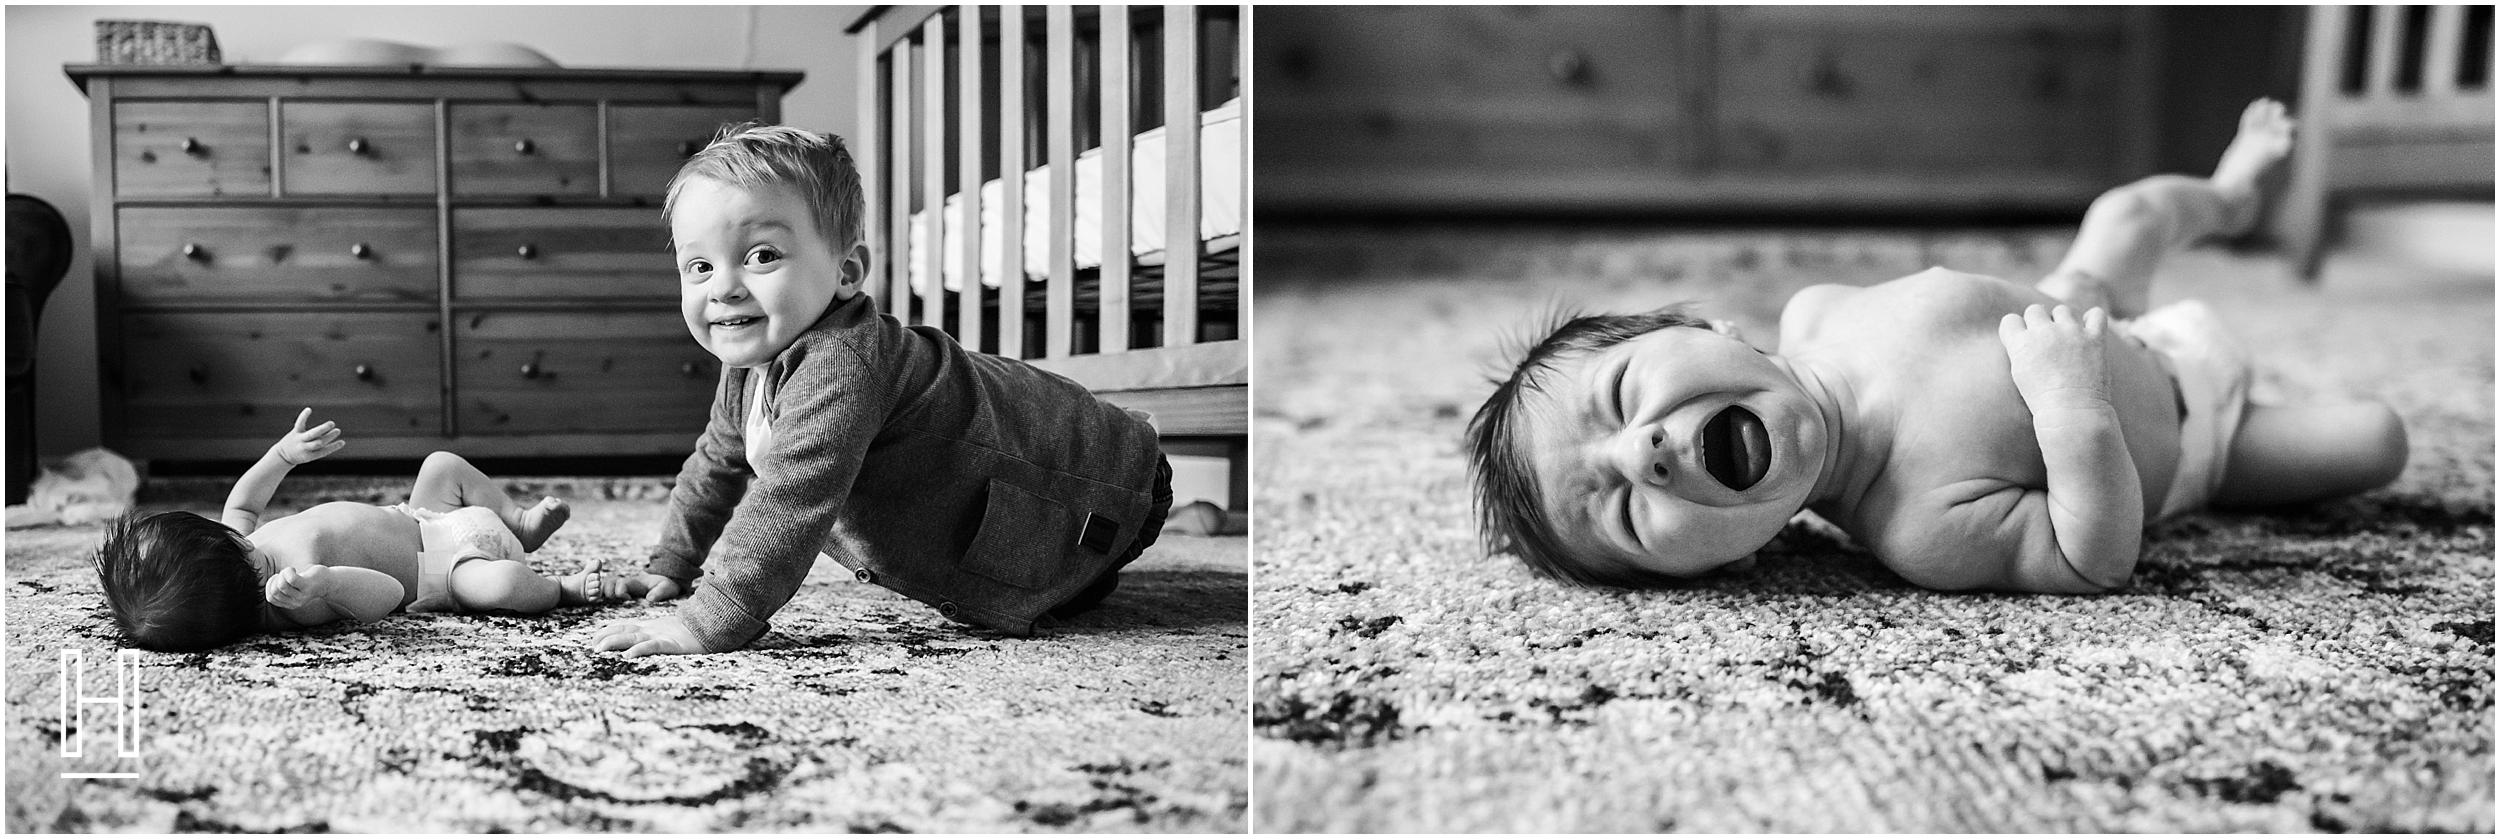 atlanta_newborn_photographer-photography_0409.jpg